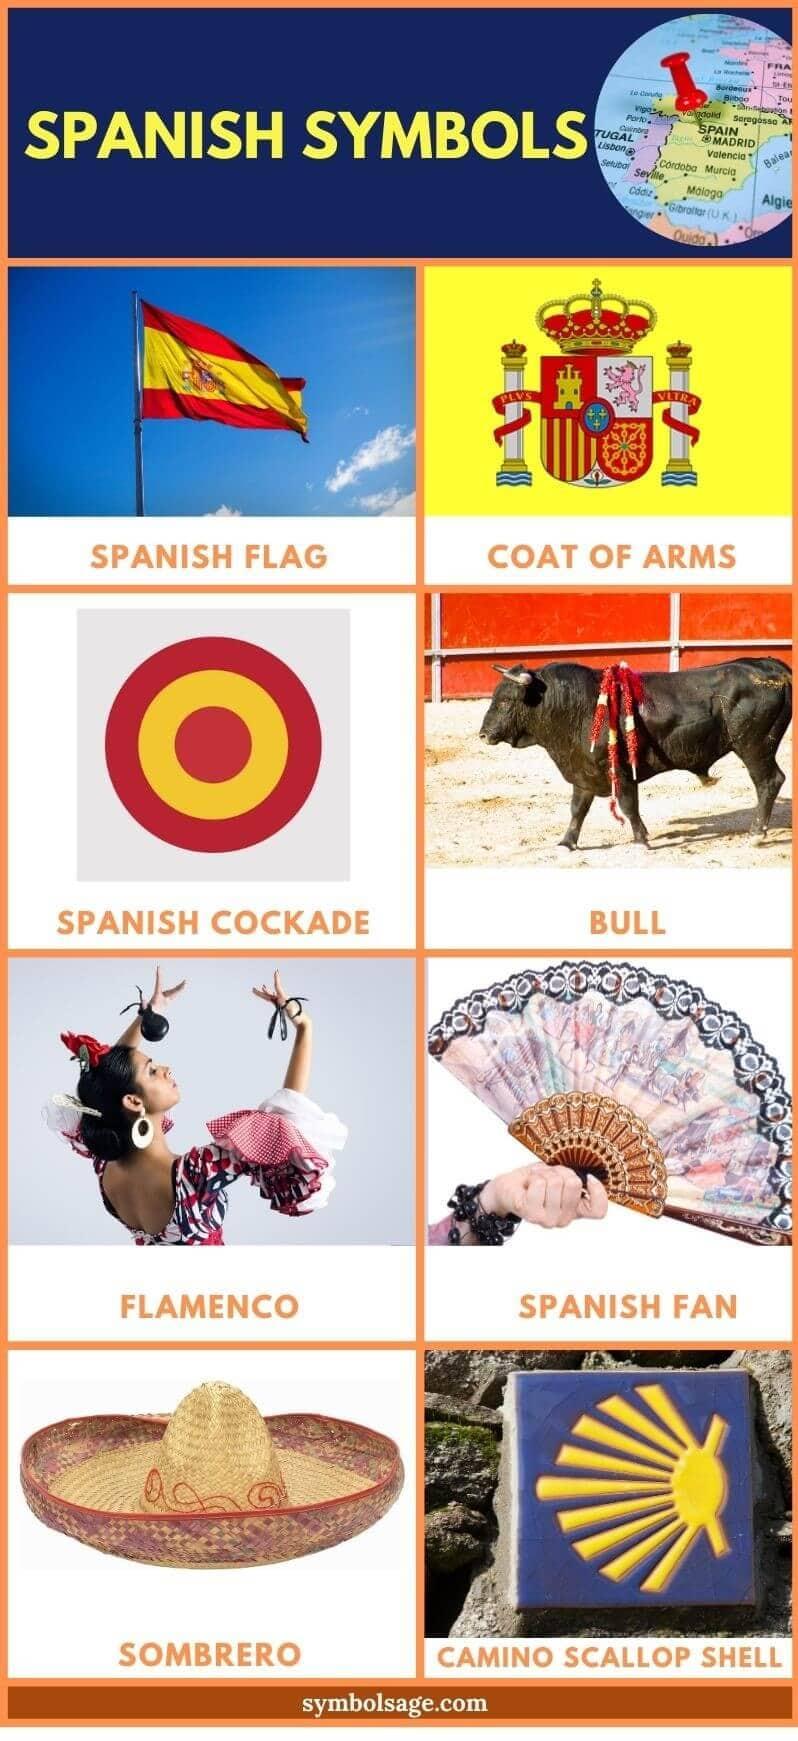 Spanish national symbols list